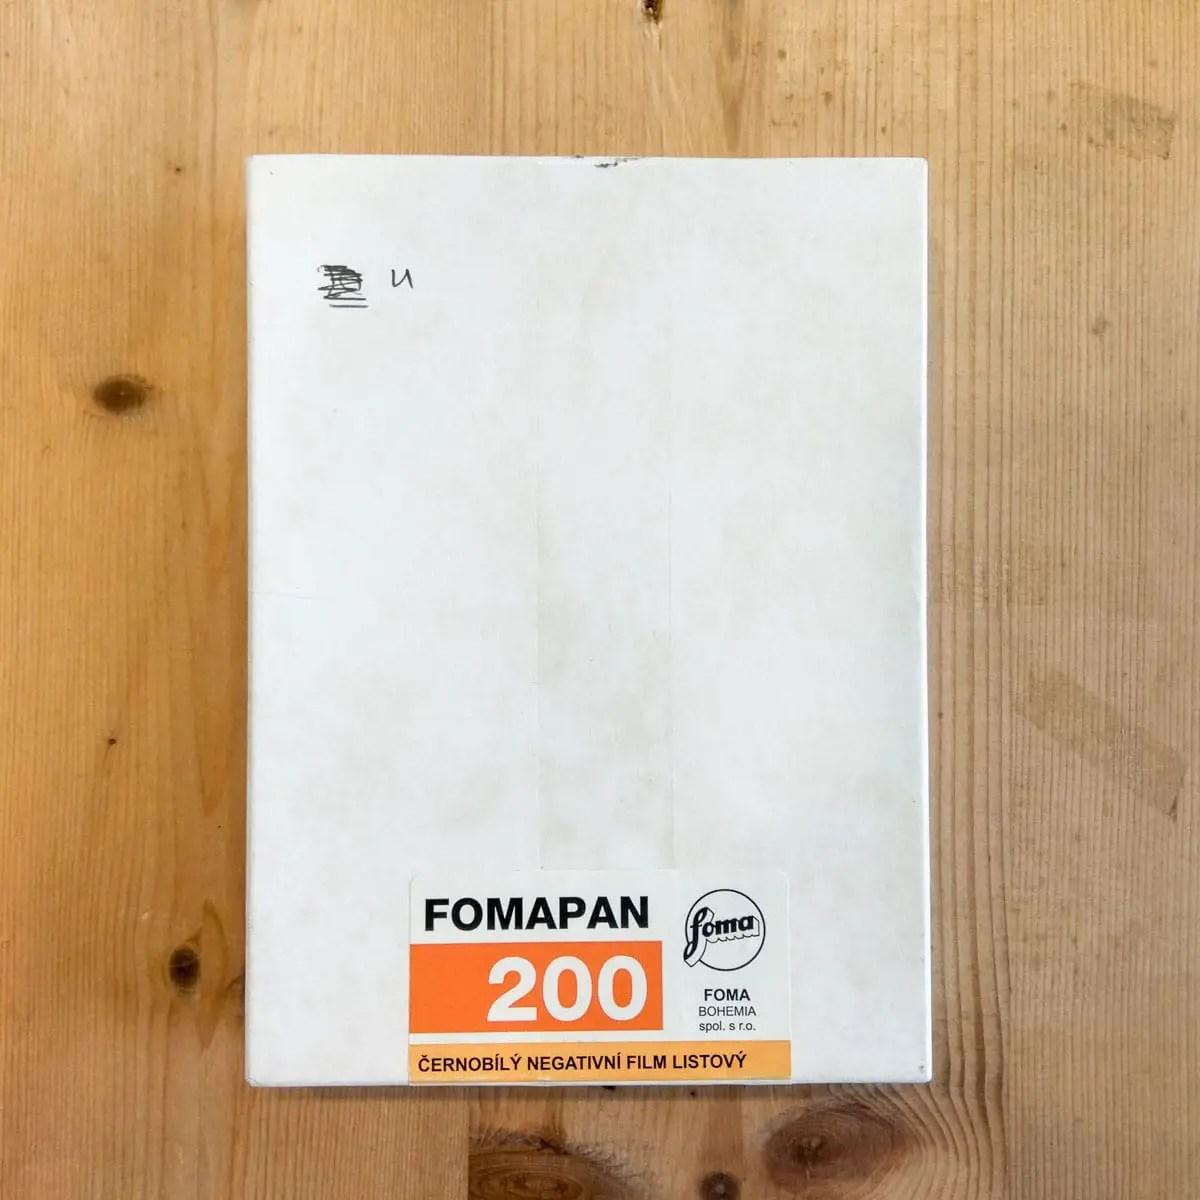 Fomapan Creative 200 4x5